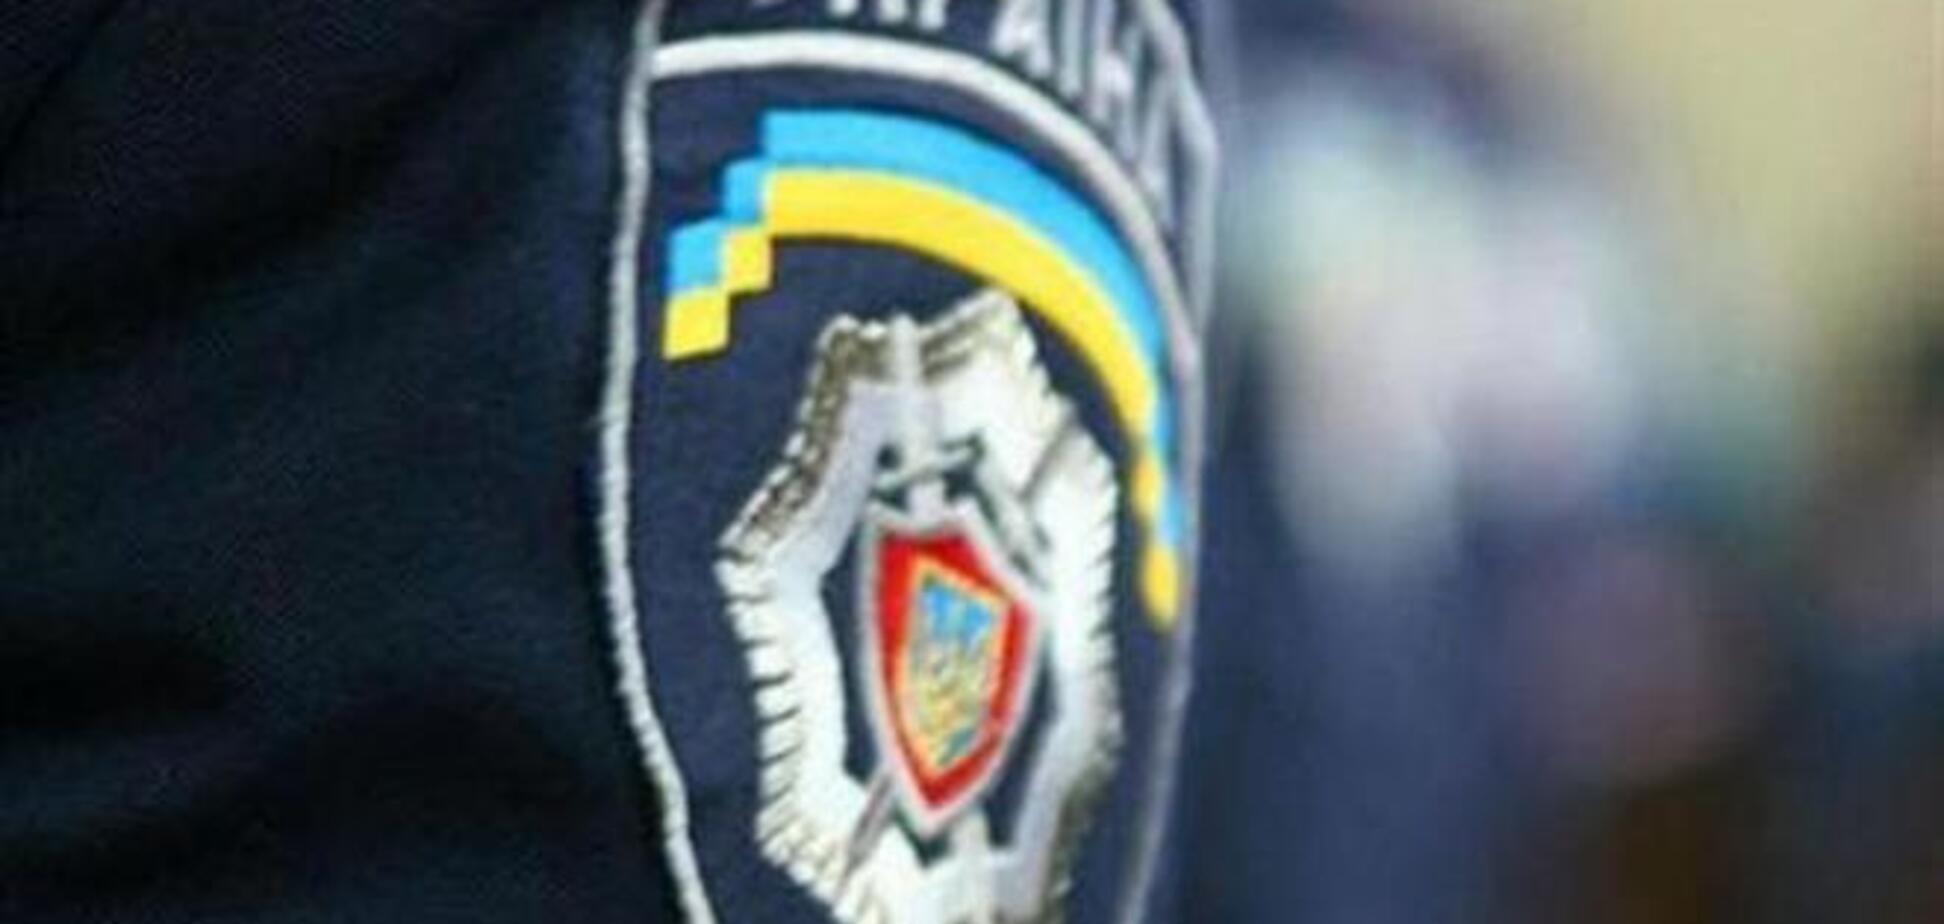 На Киевщине сожгли иномарки с агитками Лихолита, а представителю Ляшко разбили голову